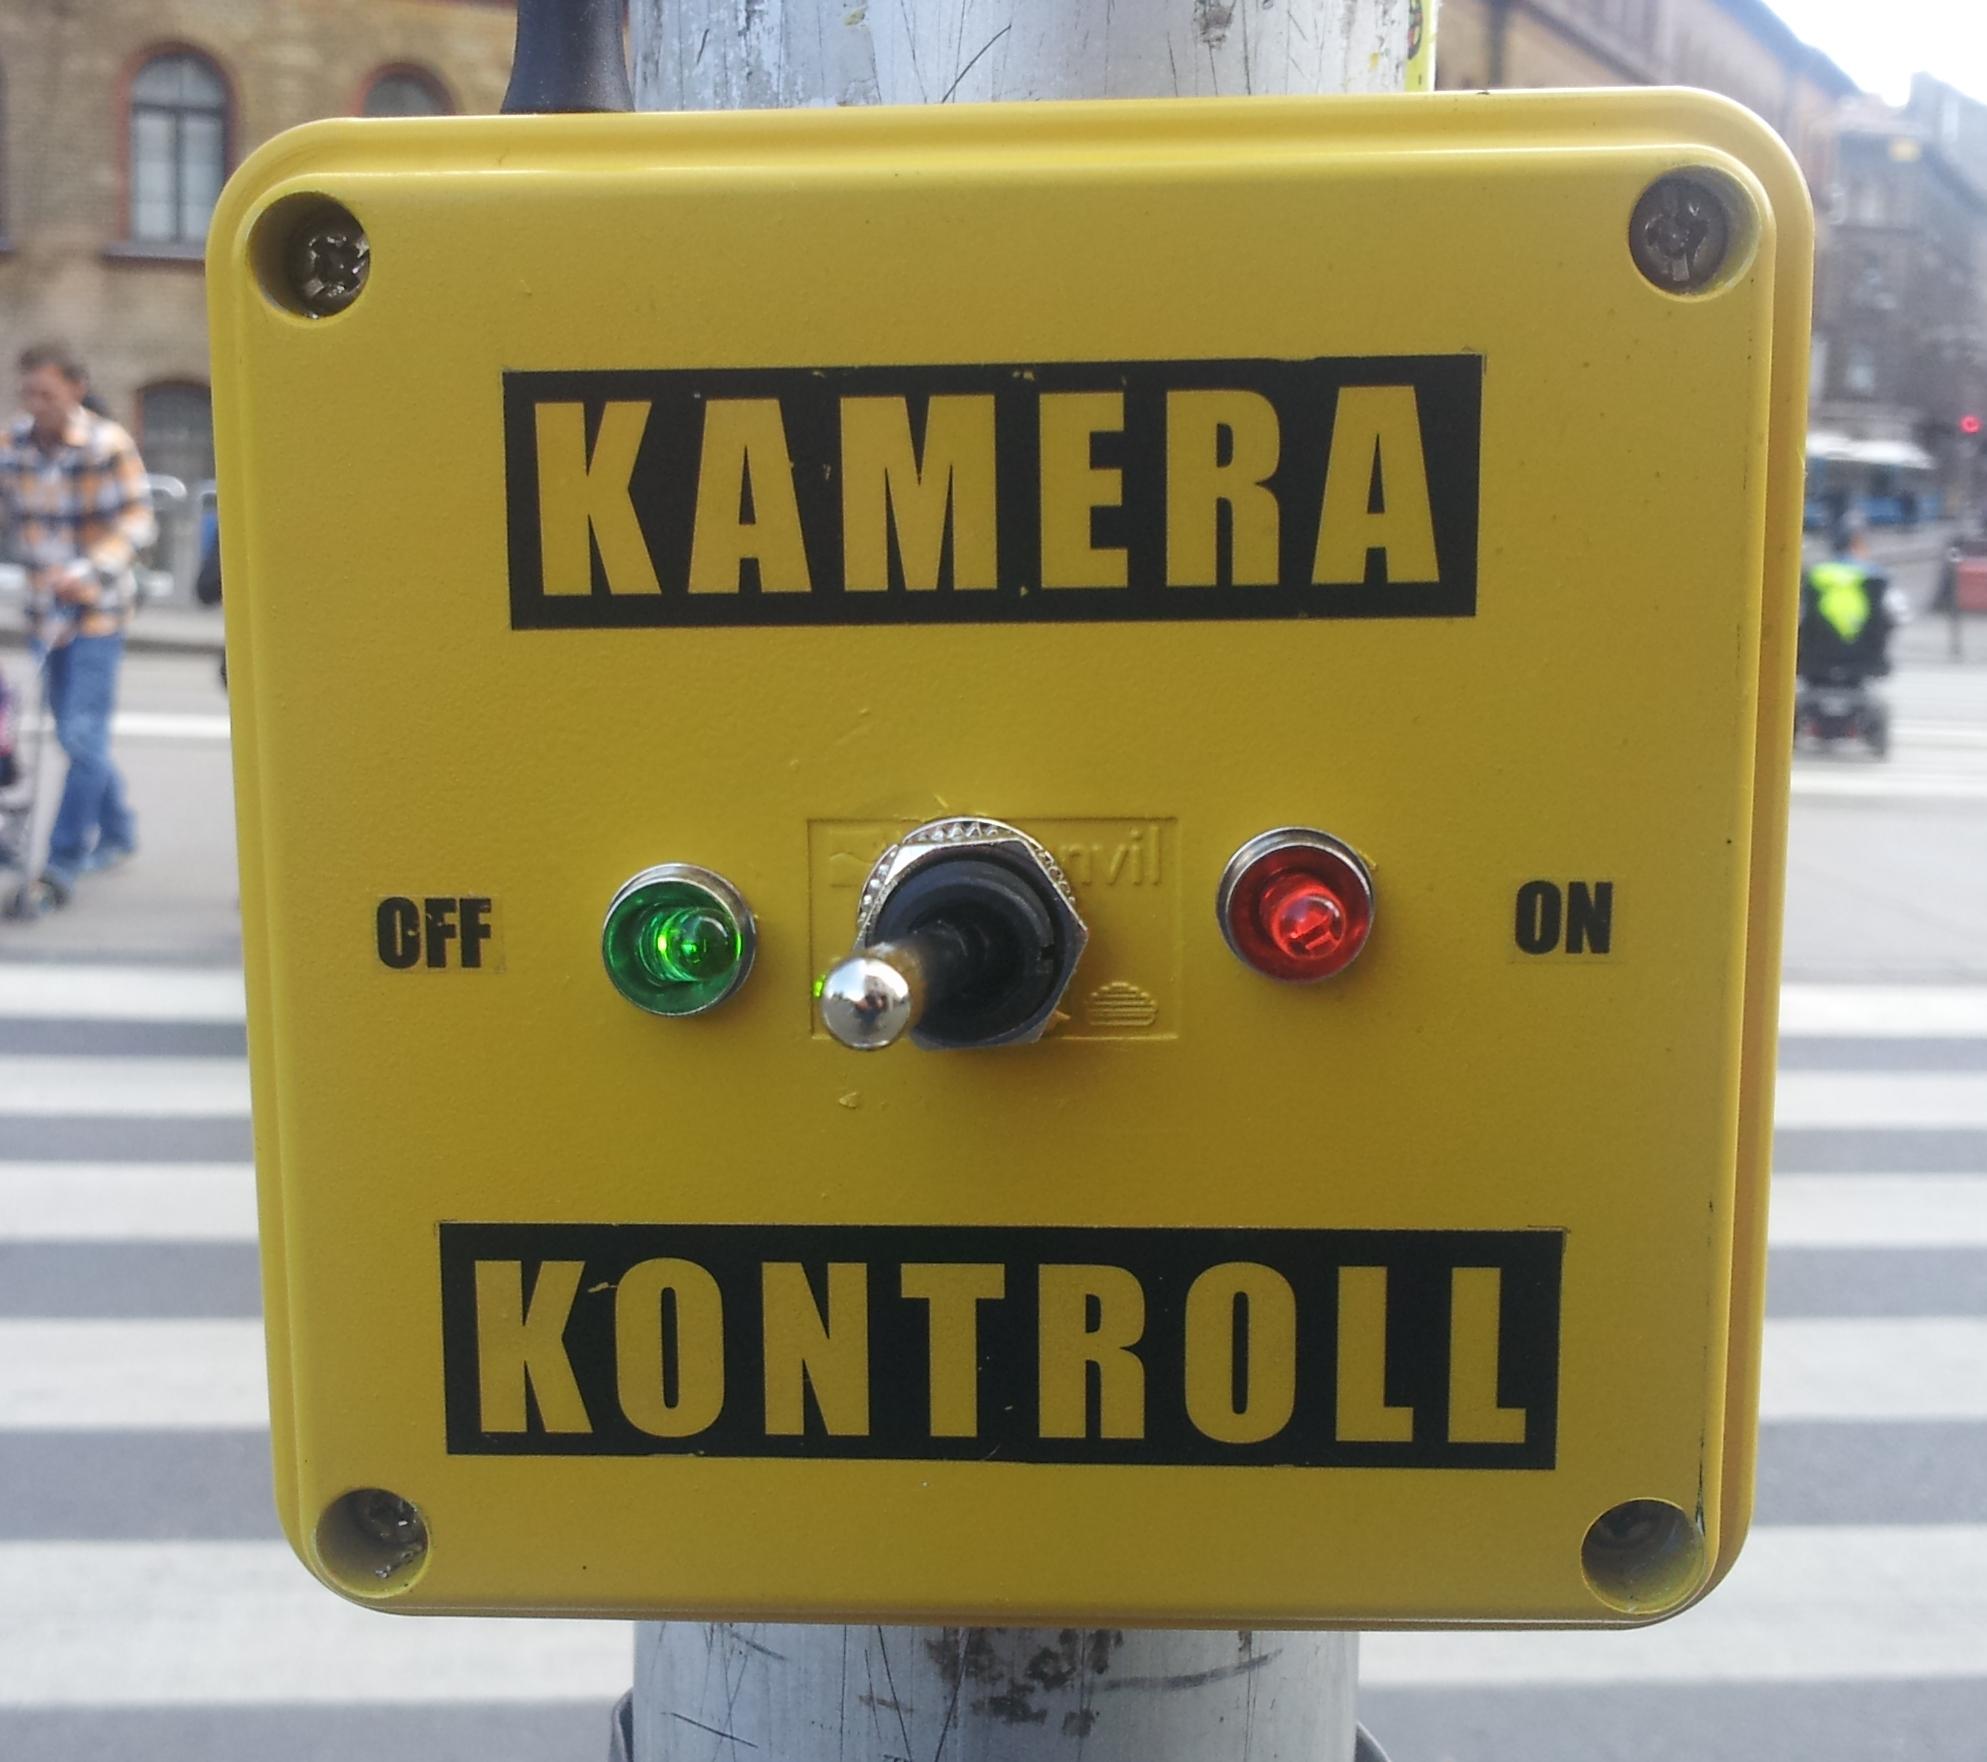 kikapcsolhato_kamera1.jpg